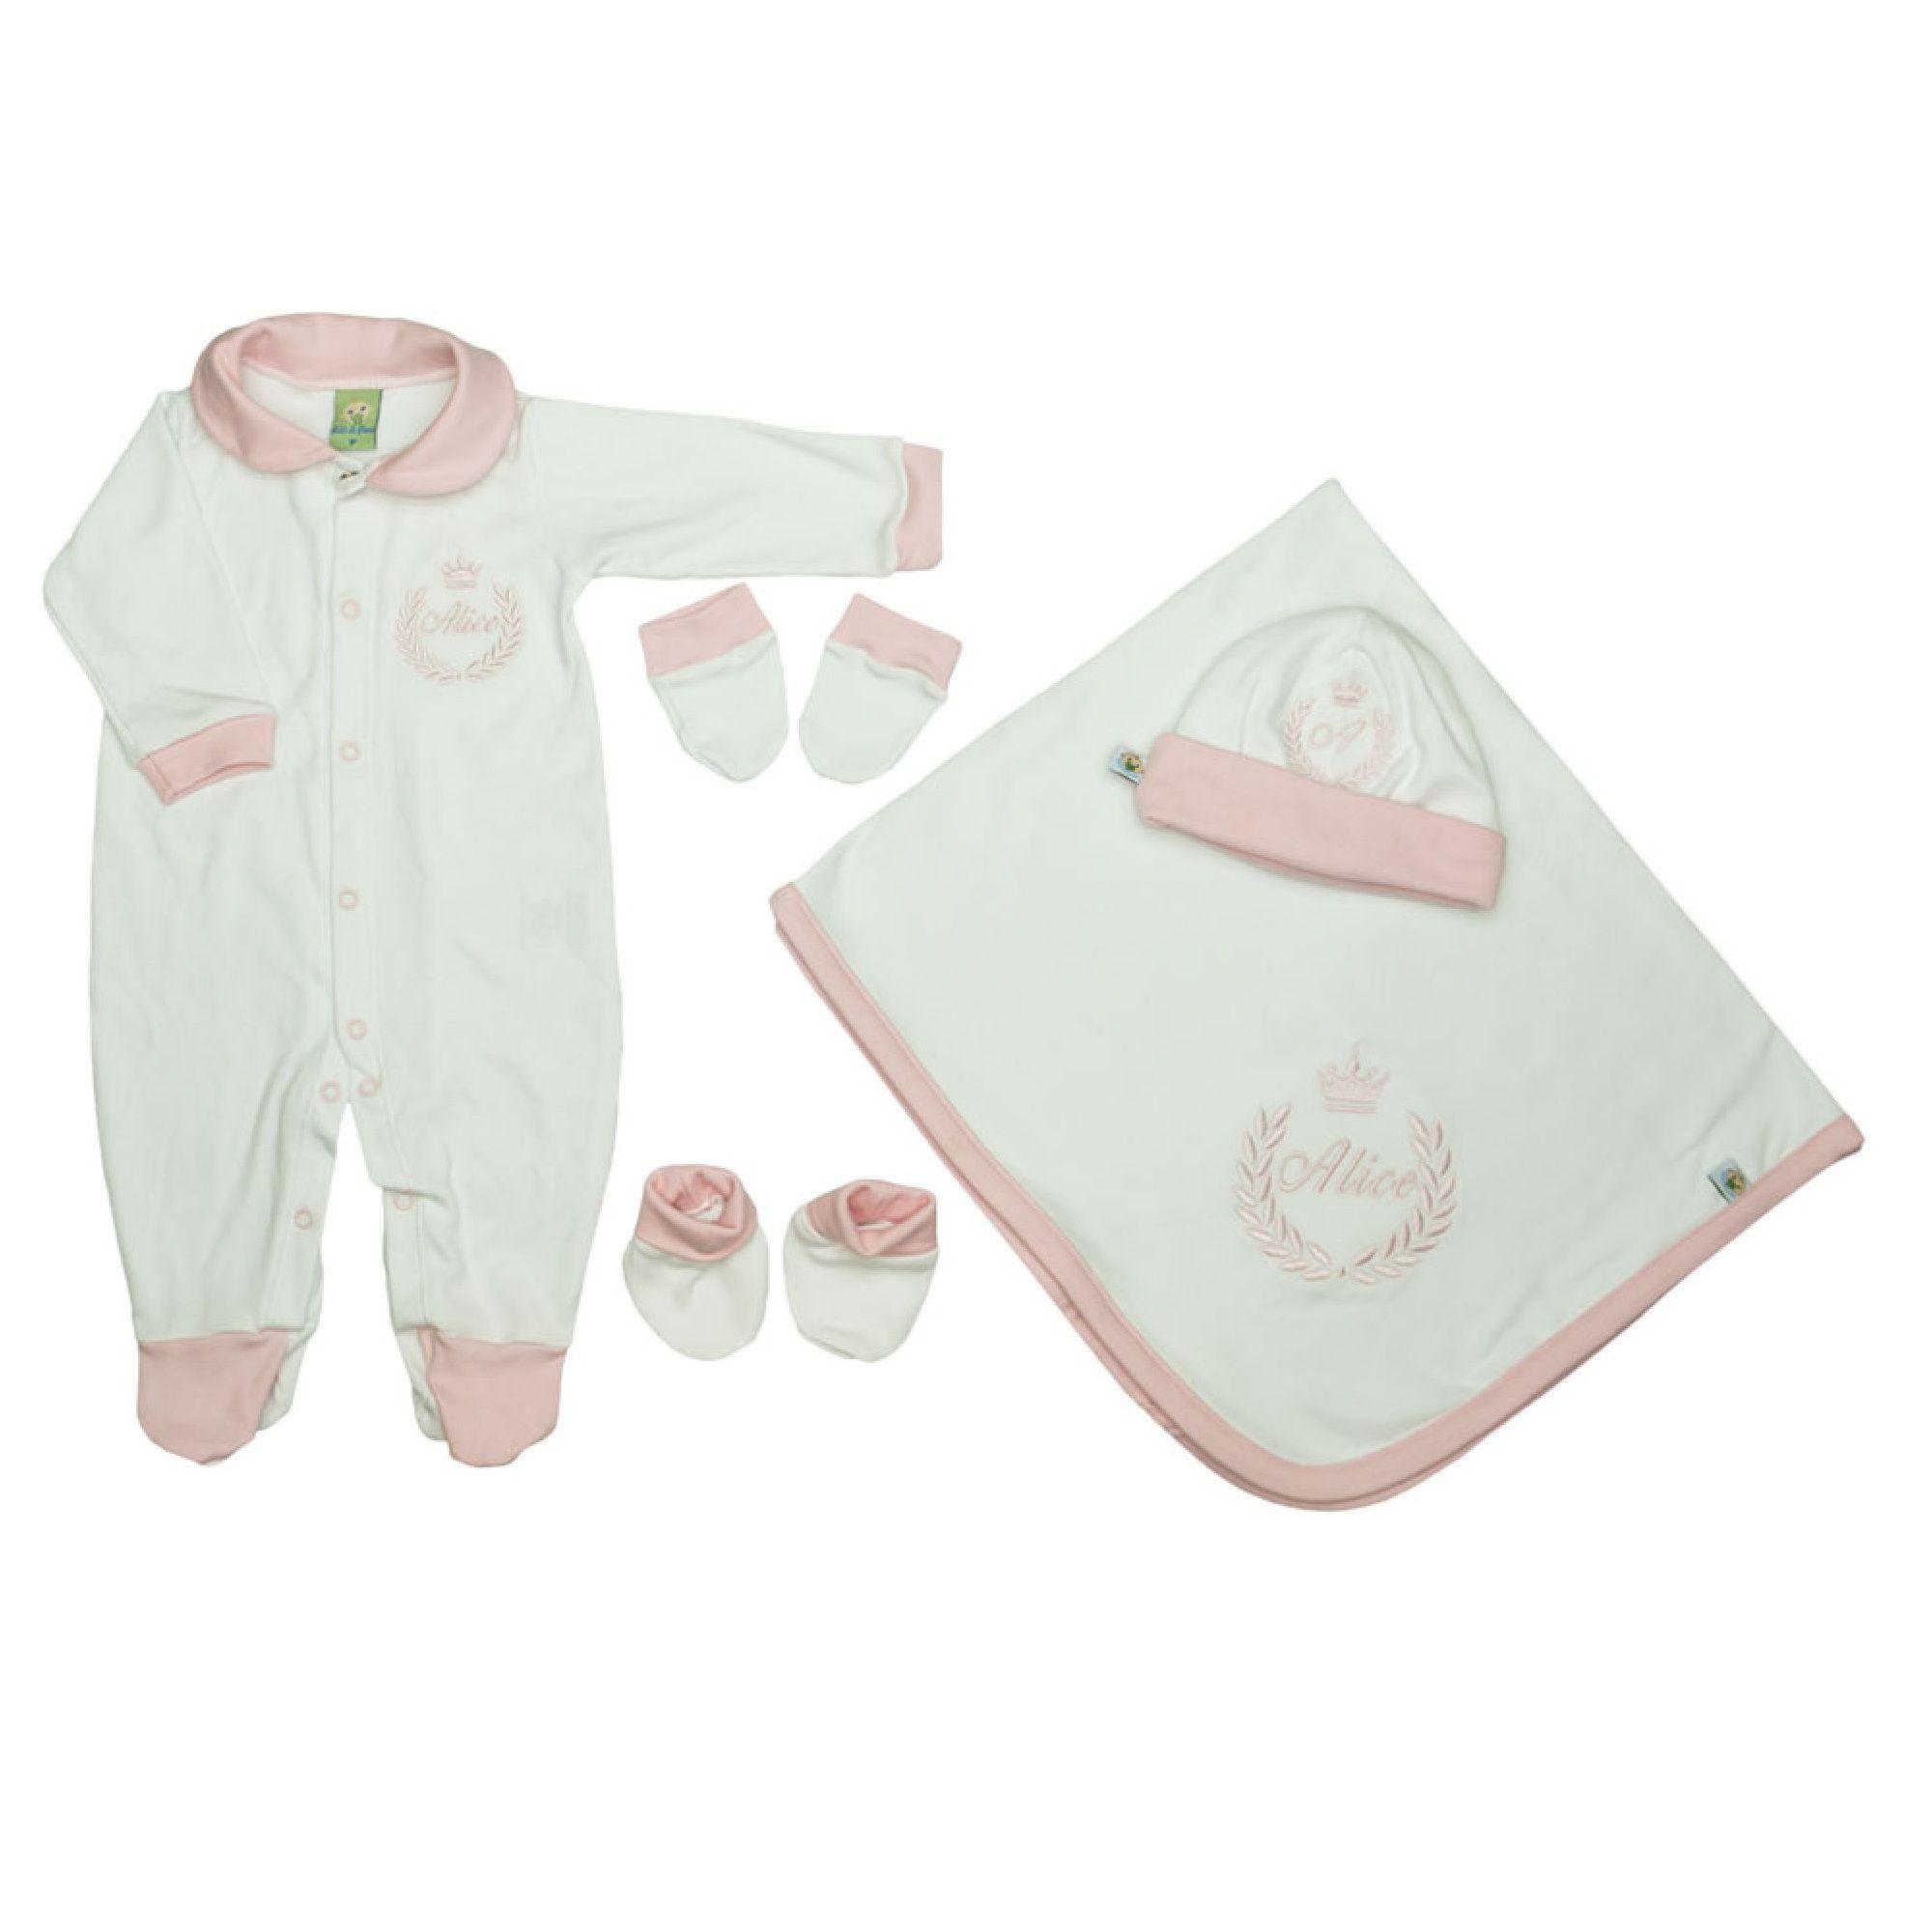 Saída de Maternidade Personalizada Branca Bordado Rosa